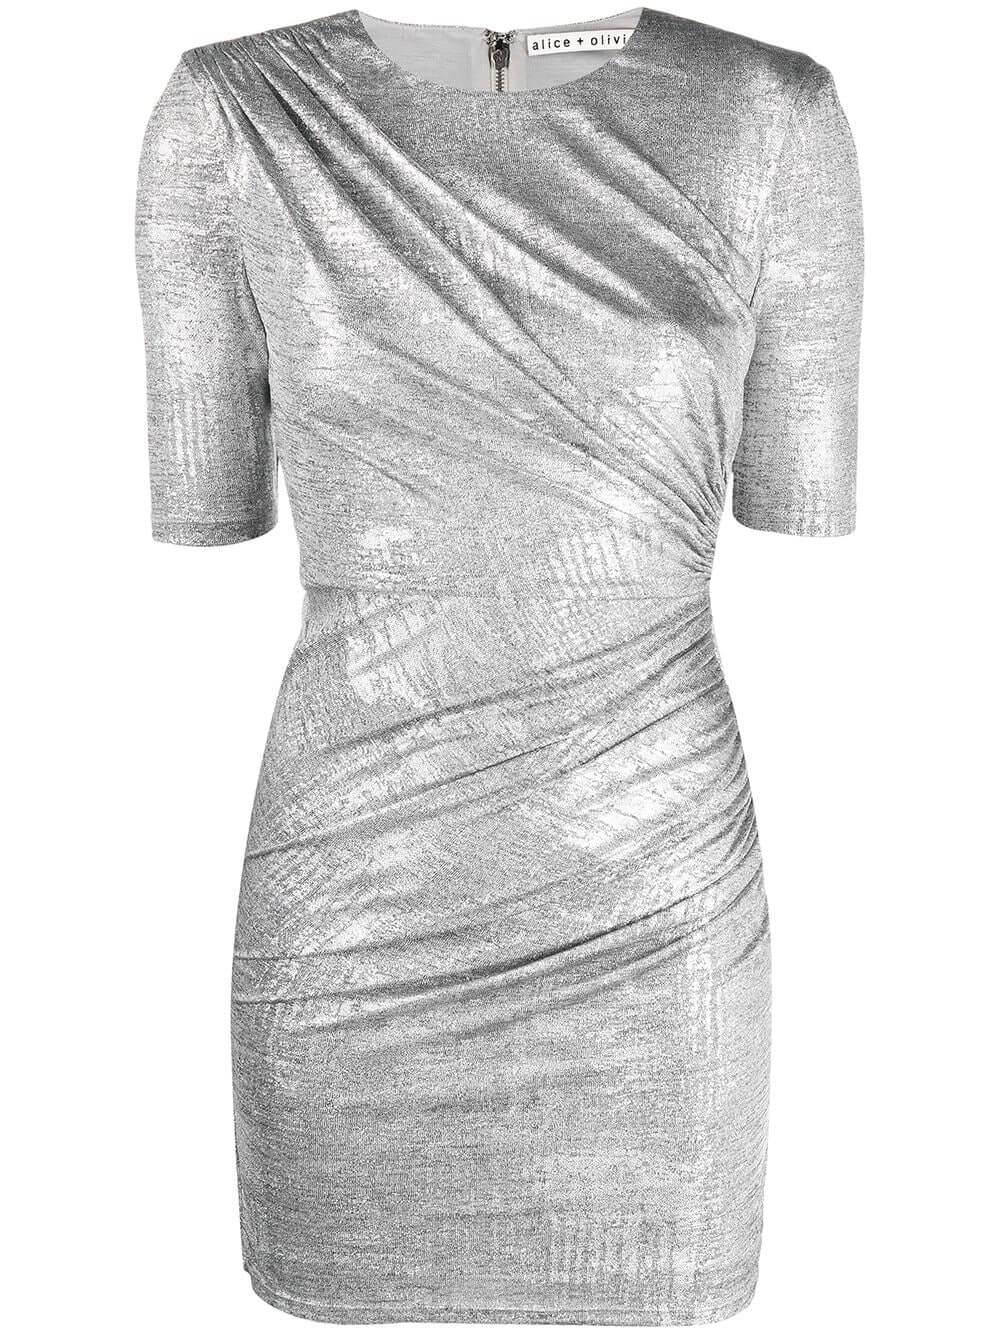 Delora Ruched Dress Item # CC011M08518-C